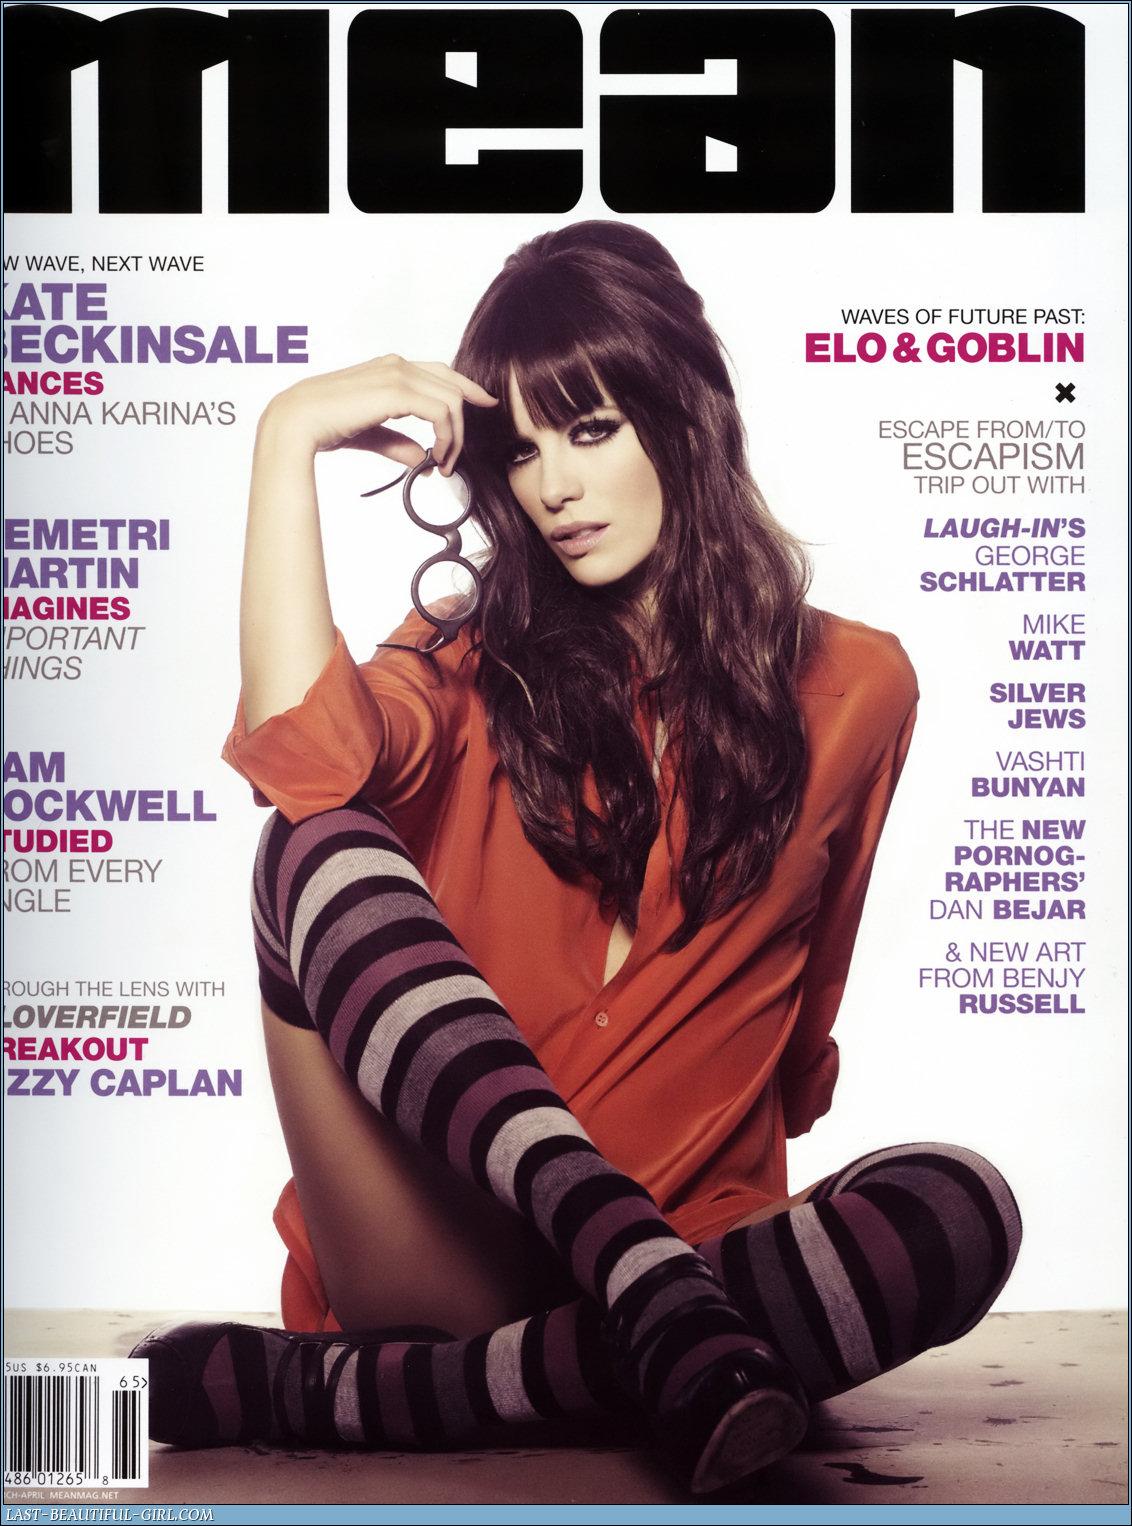 265903394_000_Kate_Beckinsale___Mean_magazine0001_122_500lo.jpg